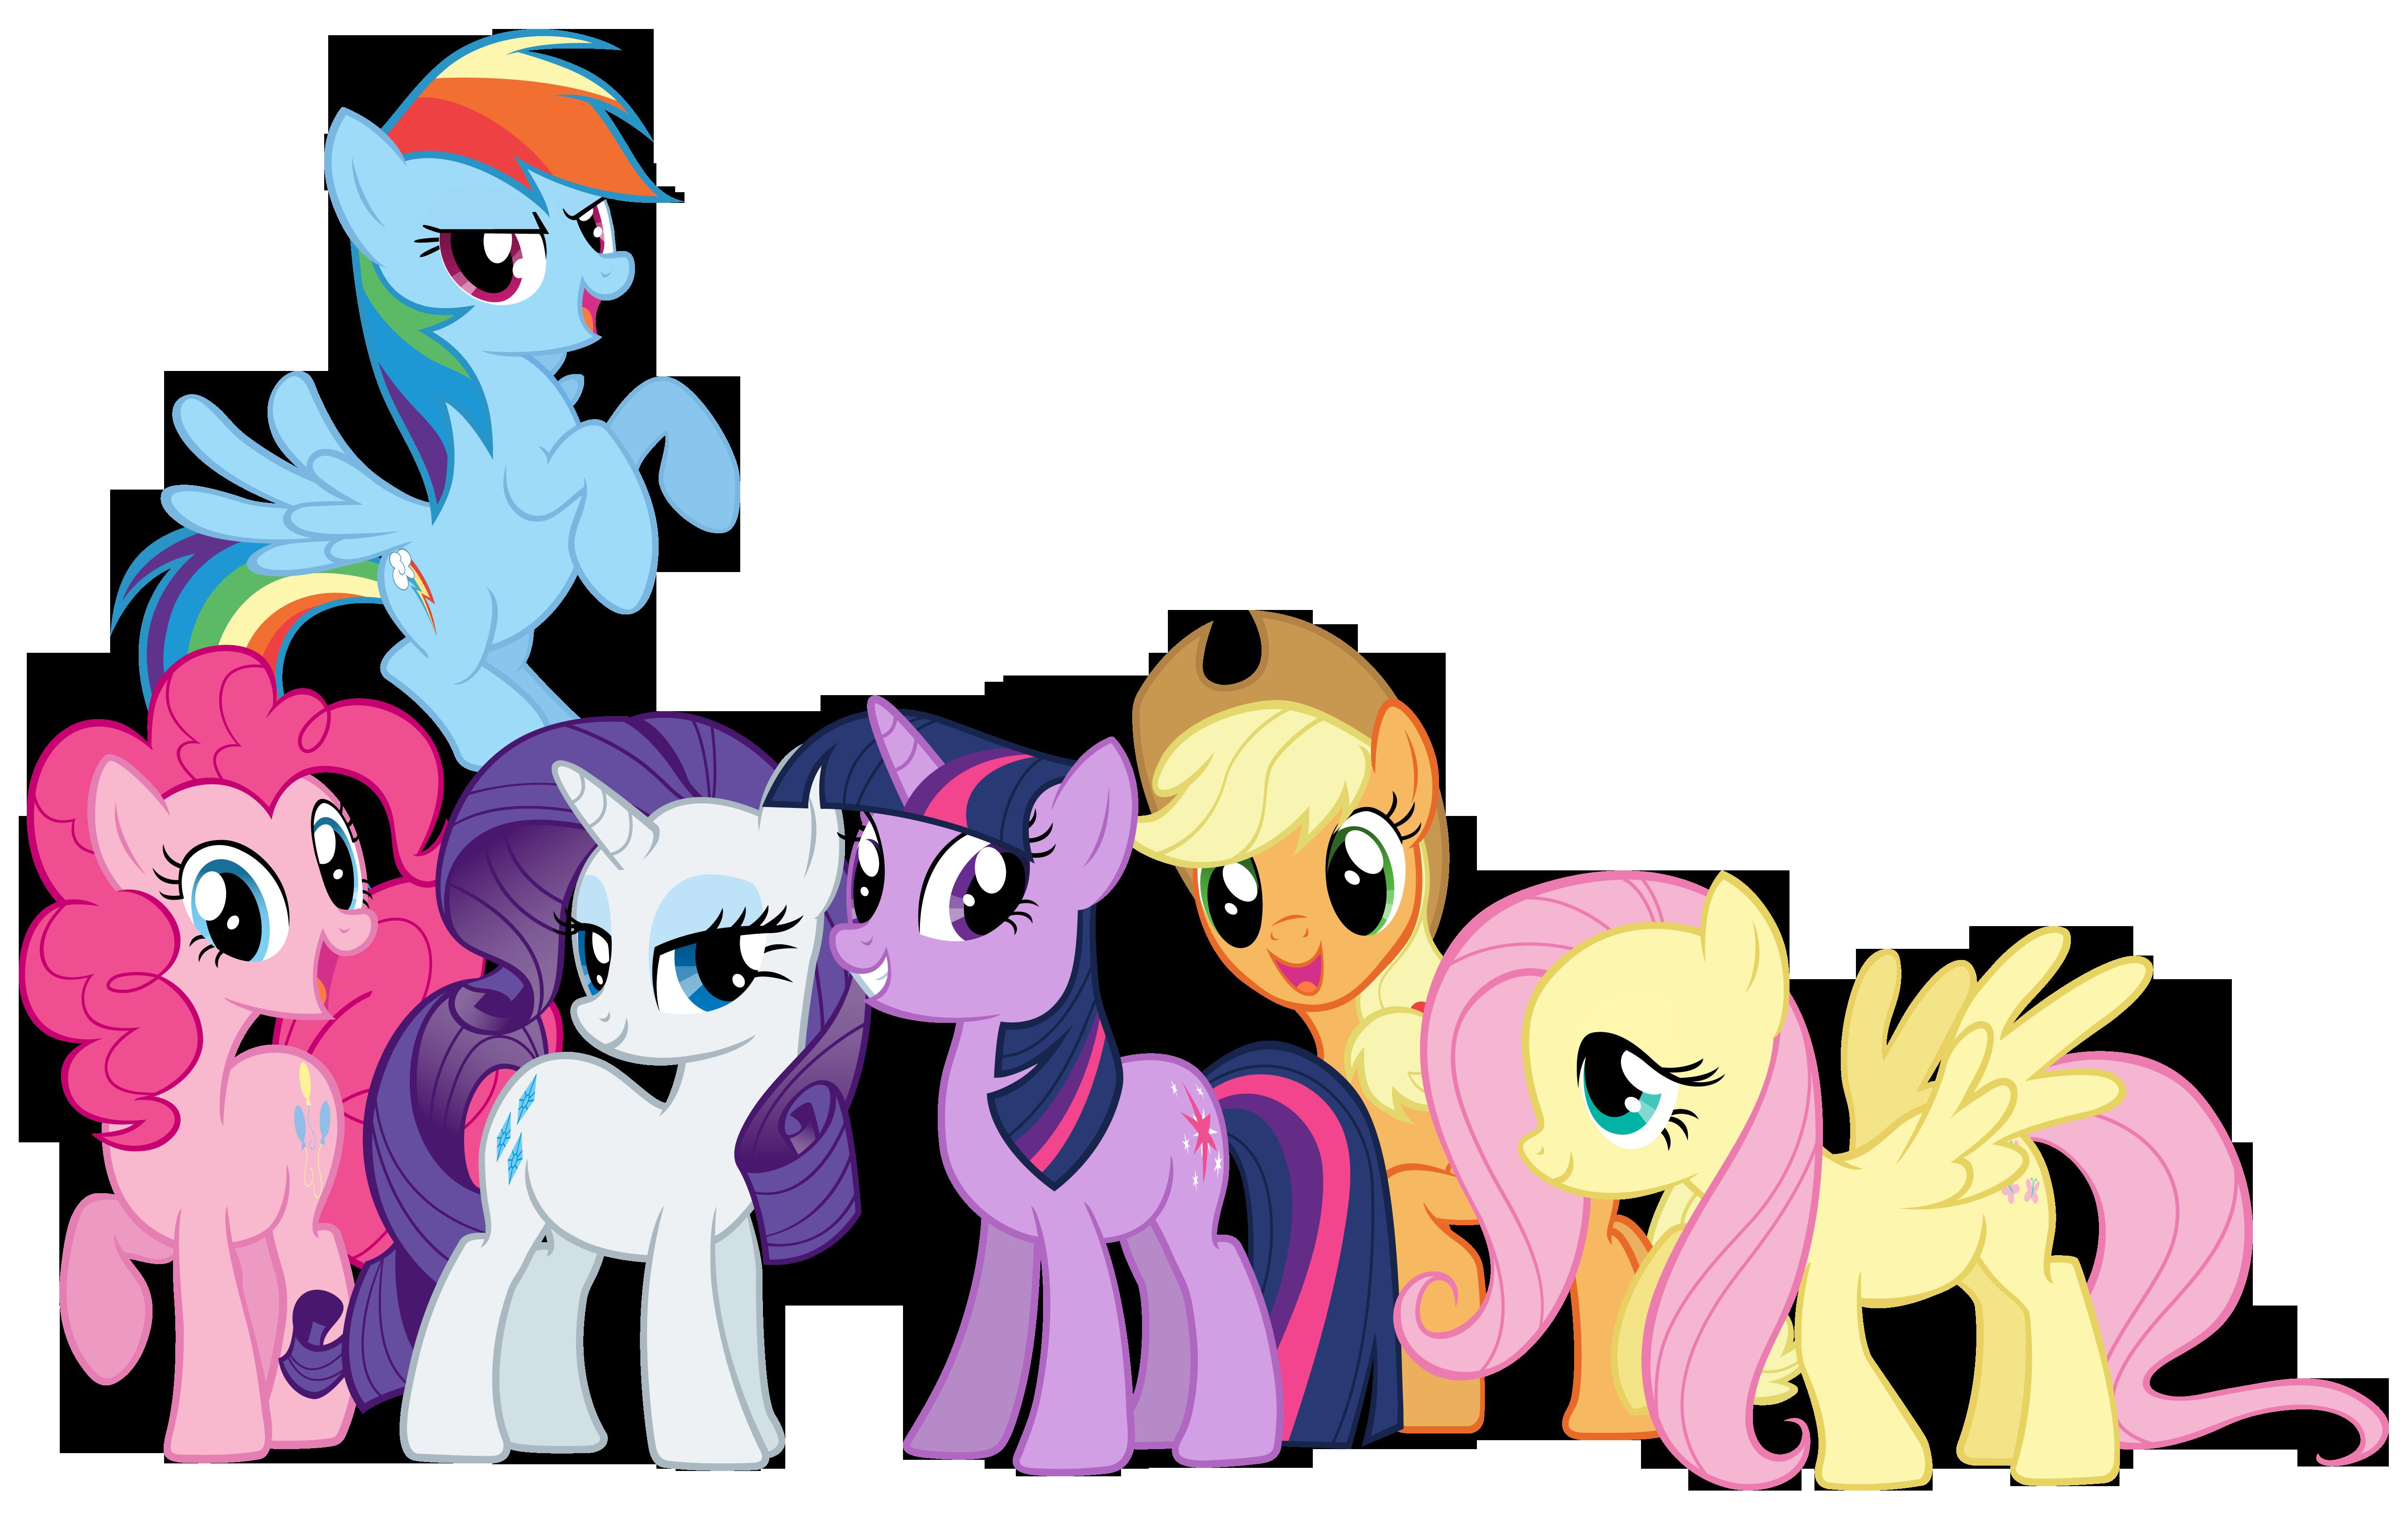 Horse News: MANE 6 ALICORNS: IT'S 'HAPPENING' (UPDATE)